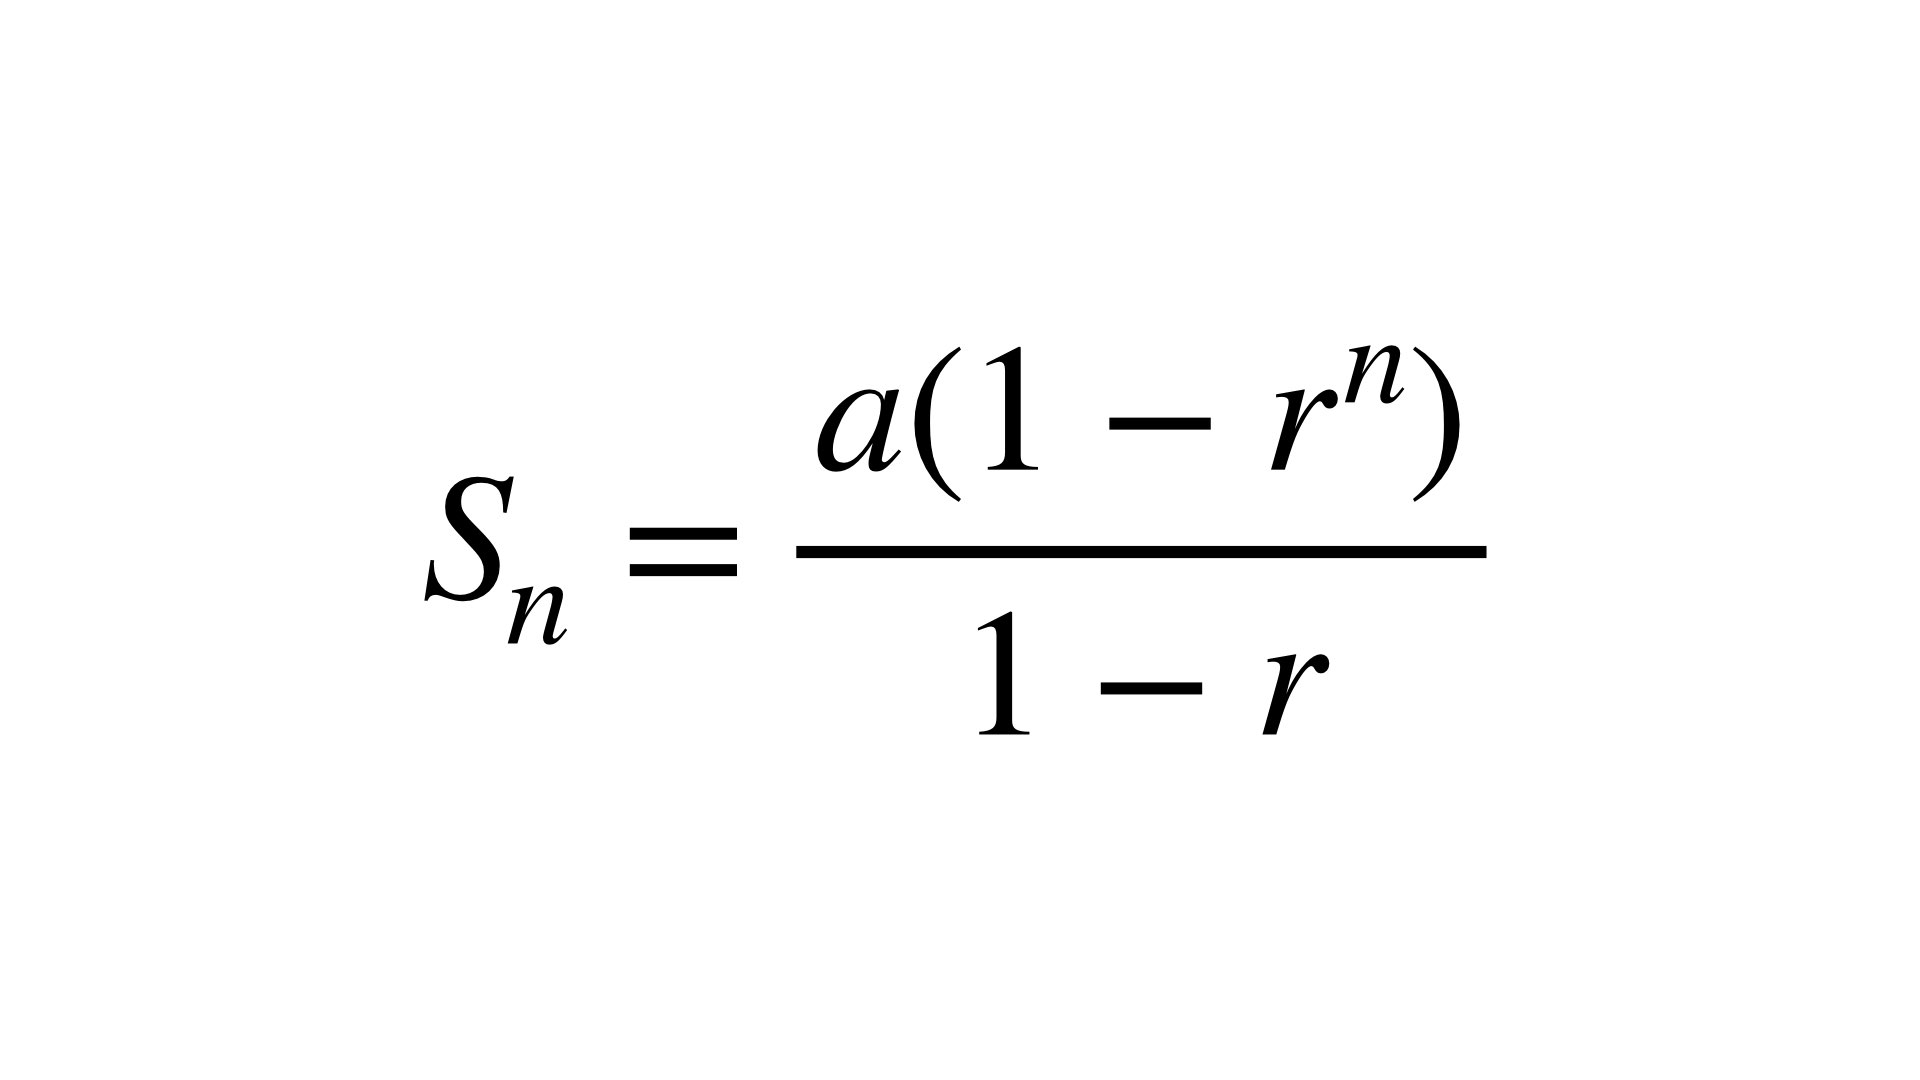 等比数列の部分和